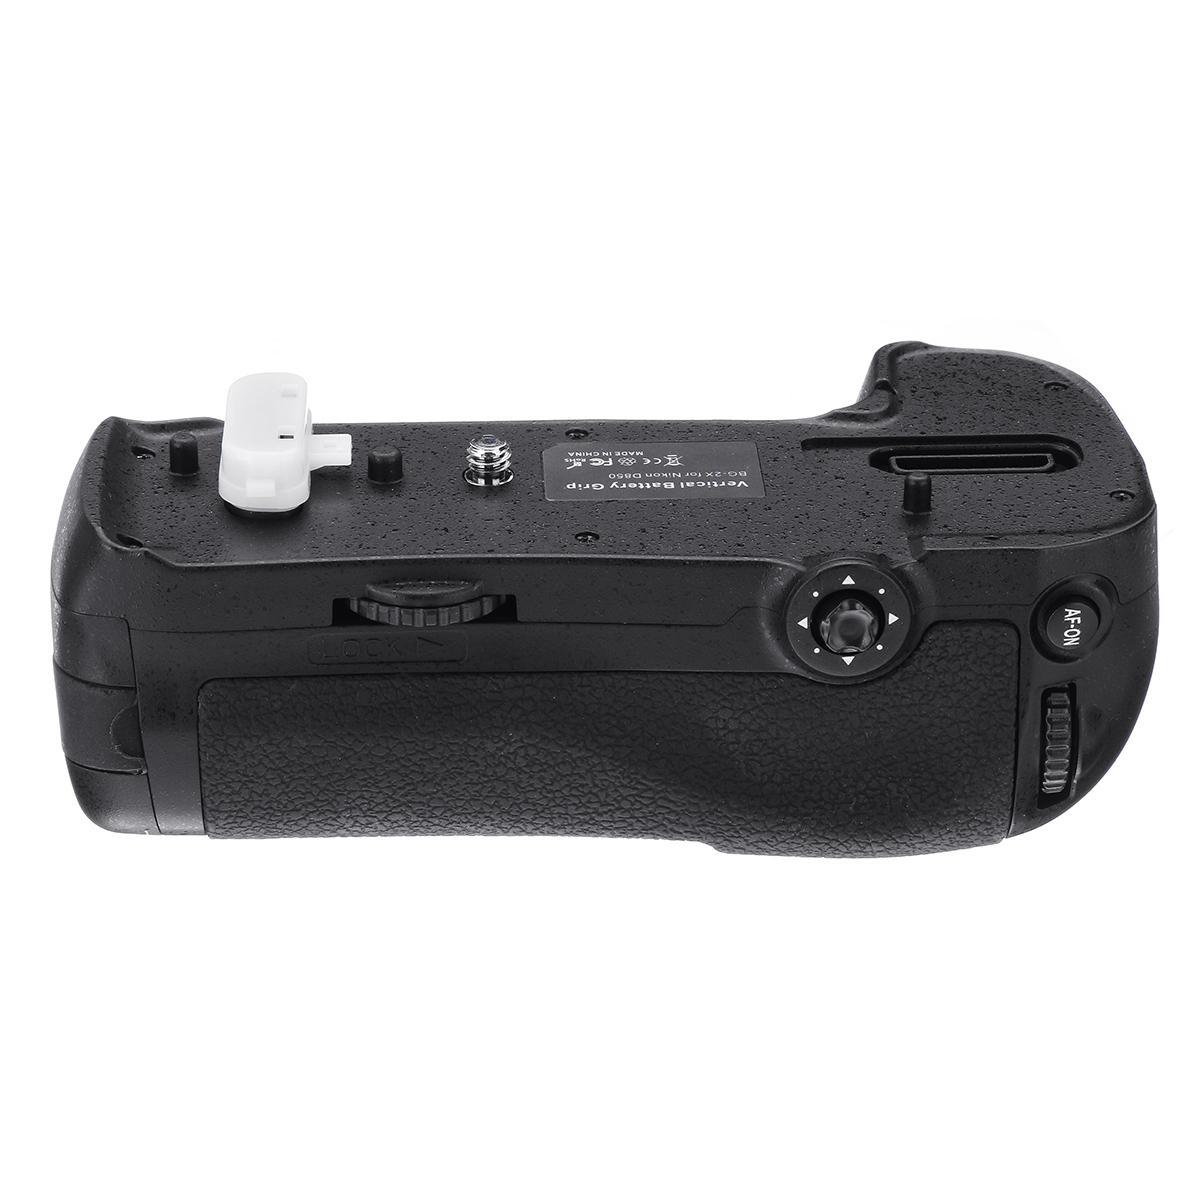 Travor Replacement Battery Grip Pack for Nikon MB-D18 D850 DSLR Camera